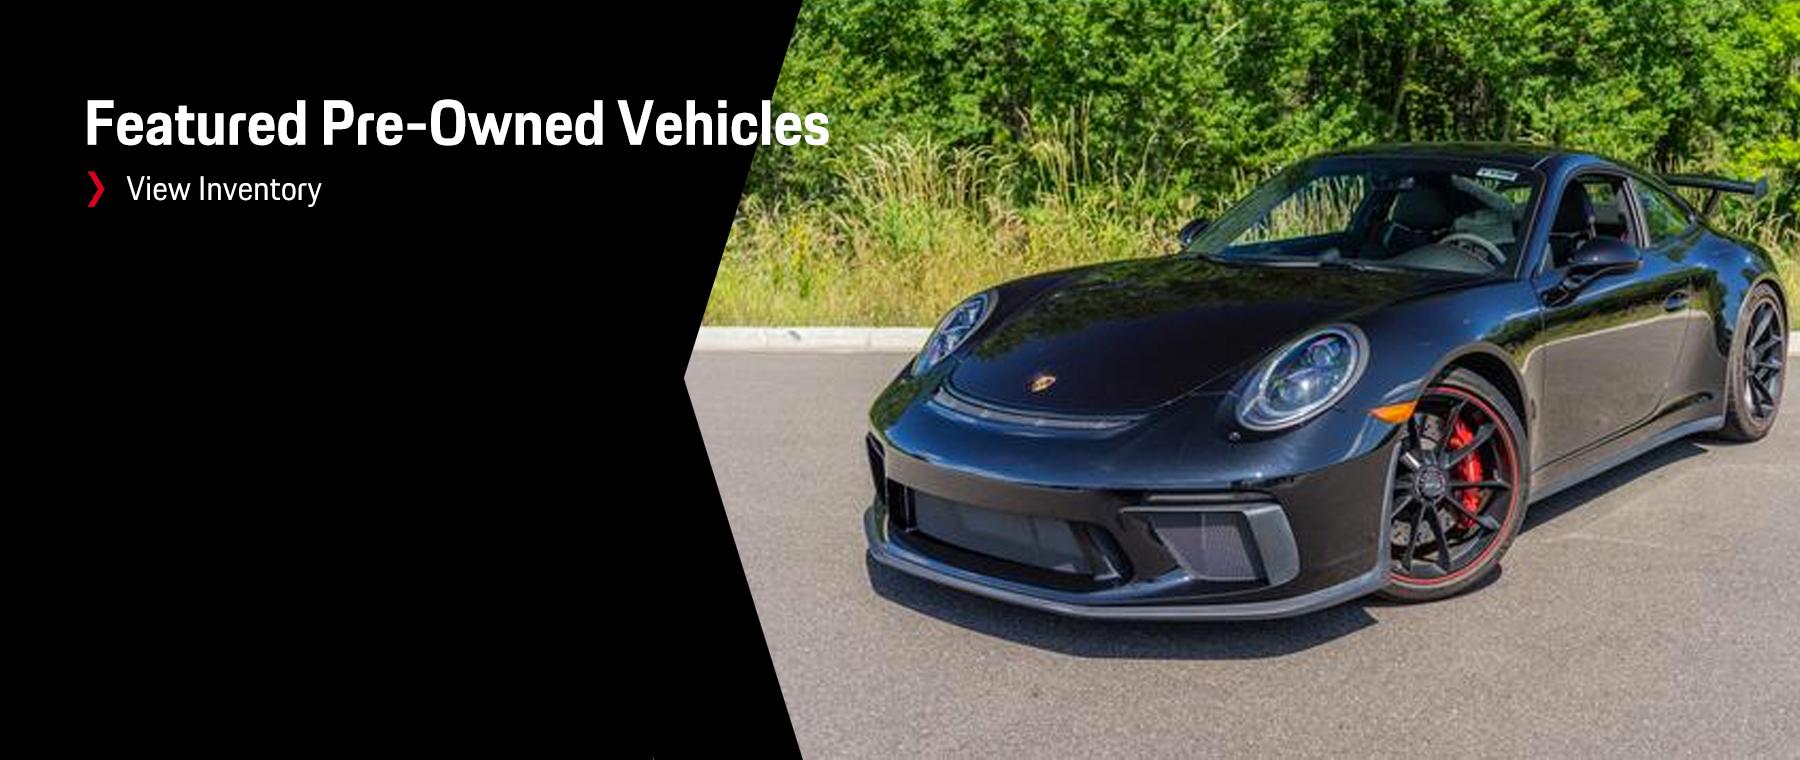 Porsche Featured Vehicles in St. Paul